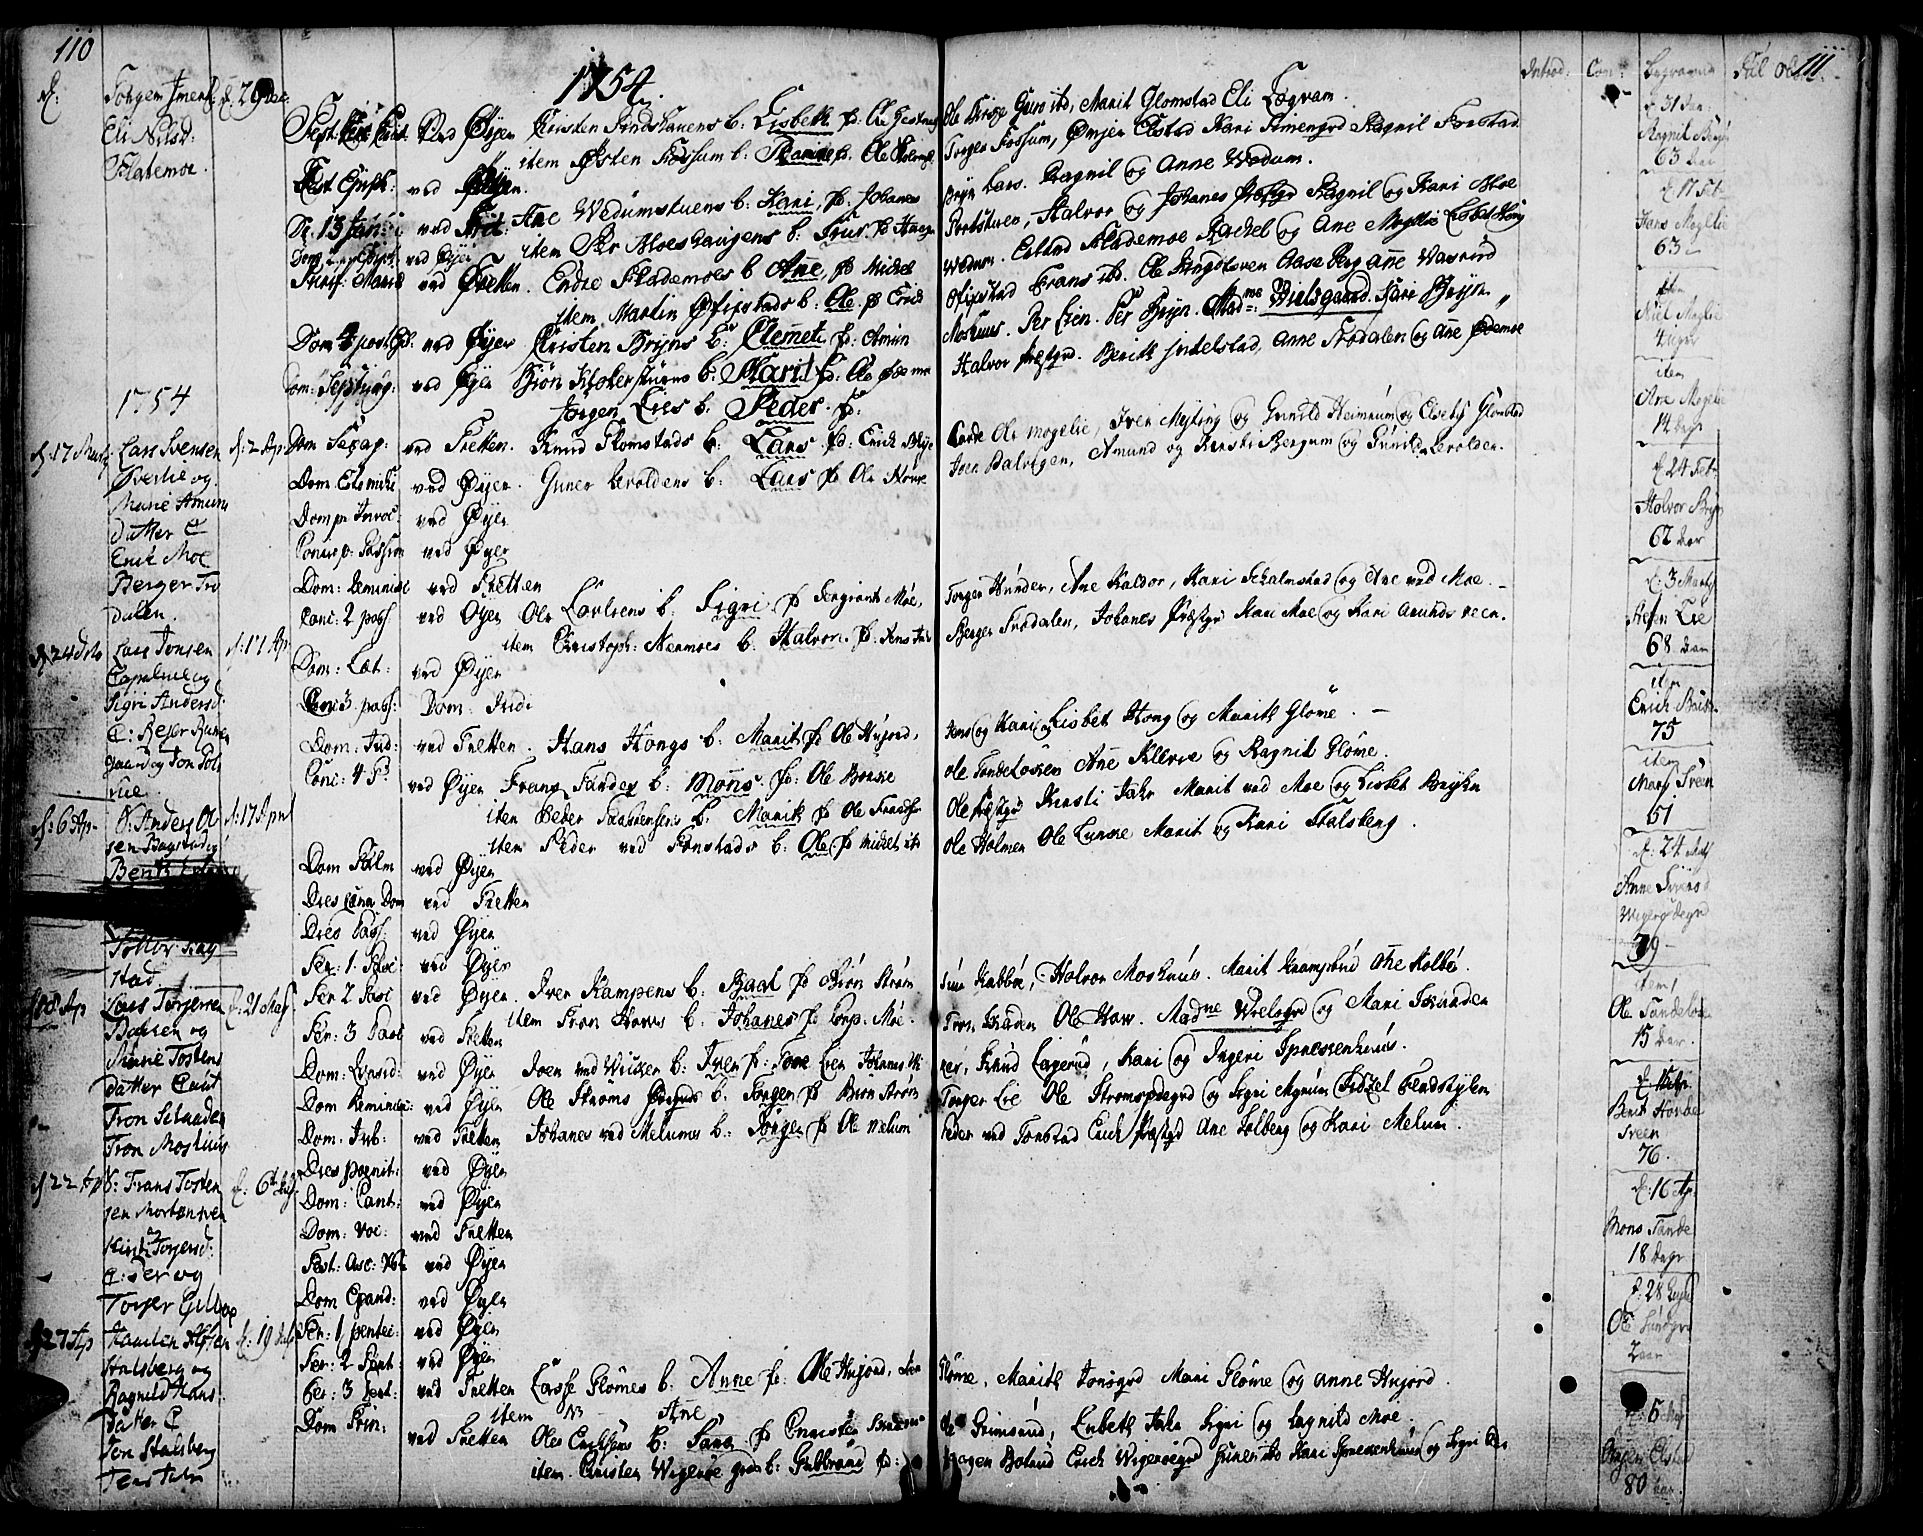 SAH, Øyer prestekontor, Ministerialbok nr. 2, 1733-1784, s. 110-111